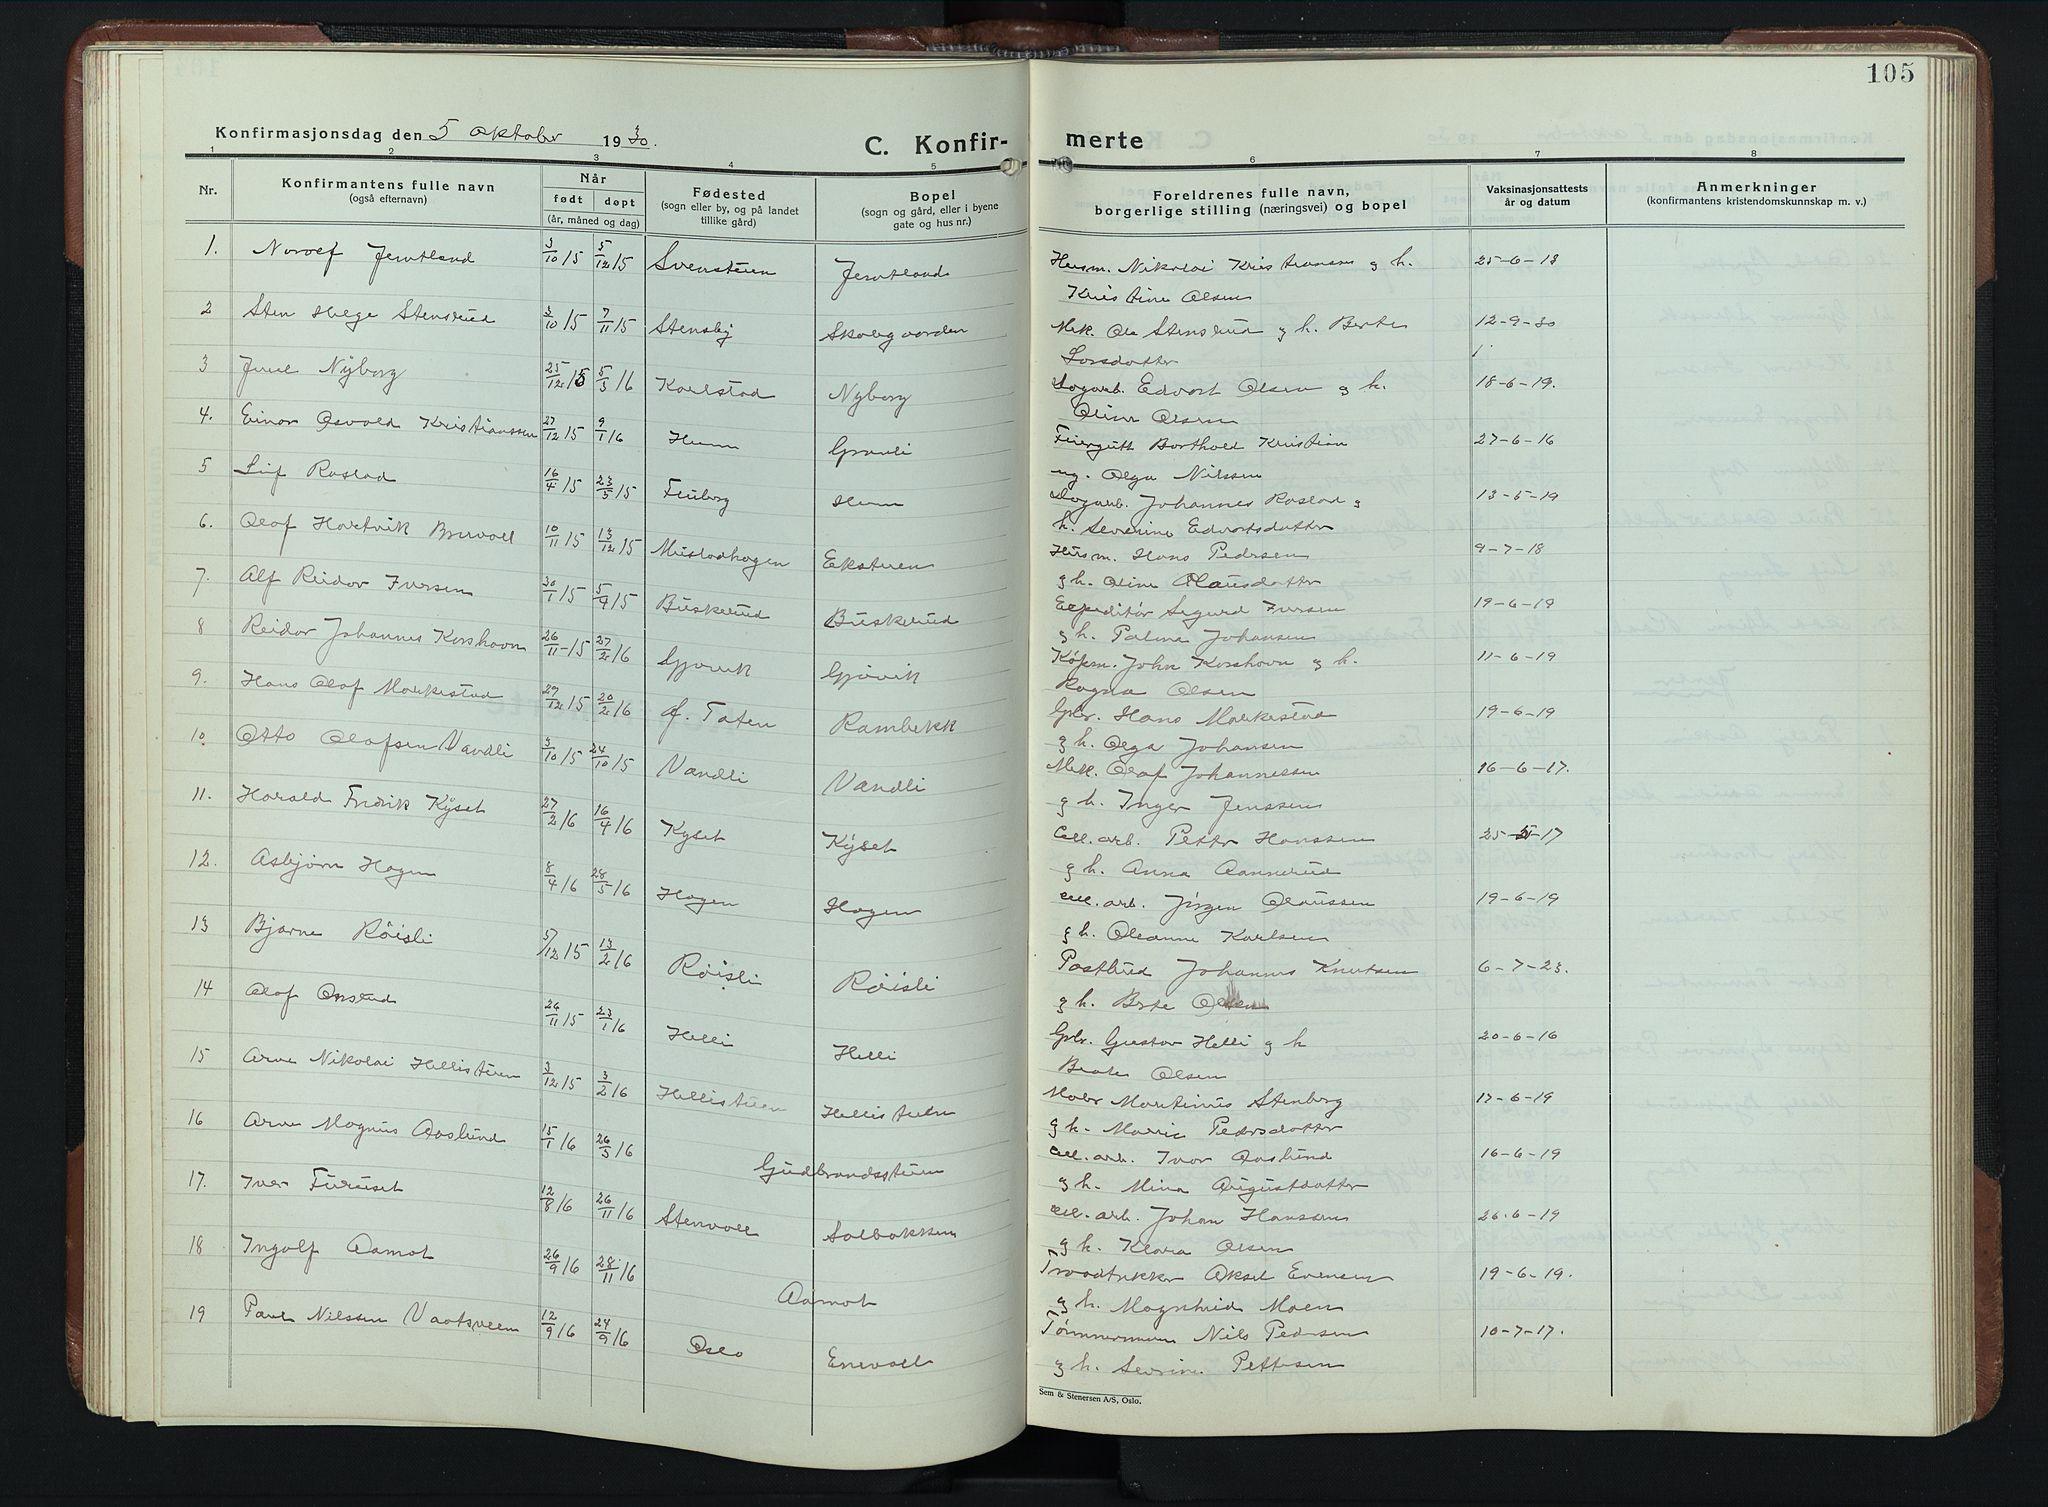 SAH, Vardal prestekontor, H/Ha/Hab/L0023: Klokkerbok nr. 23, 1929-1941, s. 105